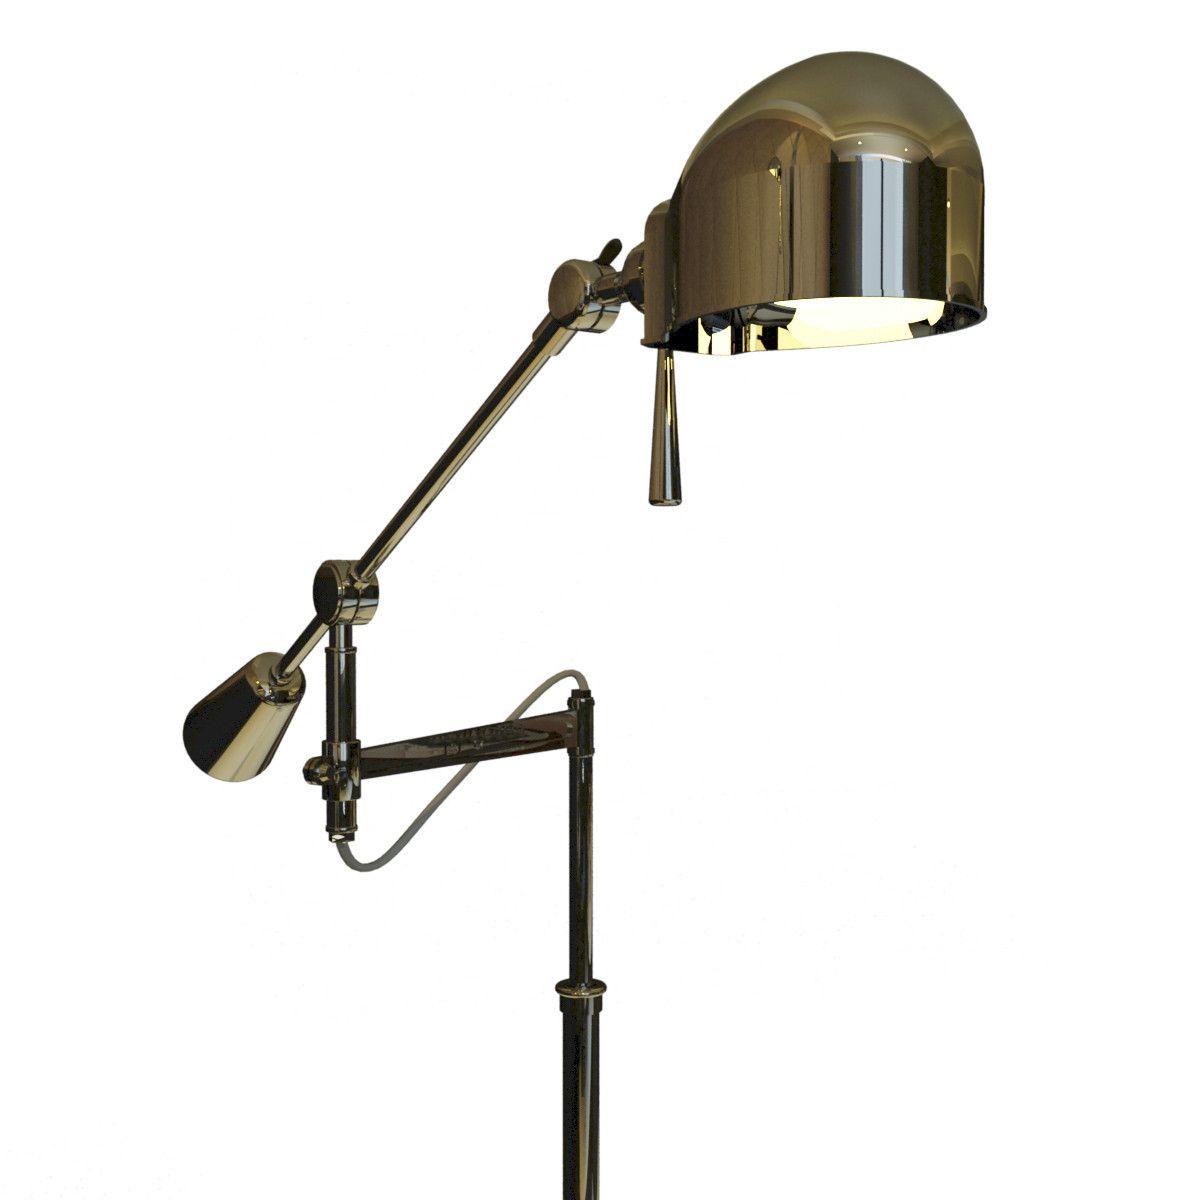 Boom arm floor lamp 3d model 3d model 3d modeling pinterest boom arm floor lamp 3d model 3d model mozeypictures Images